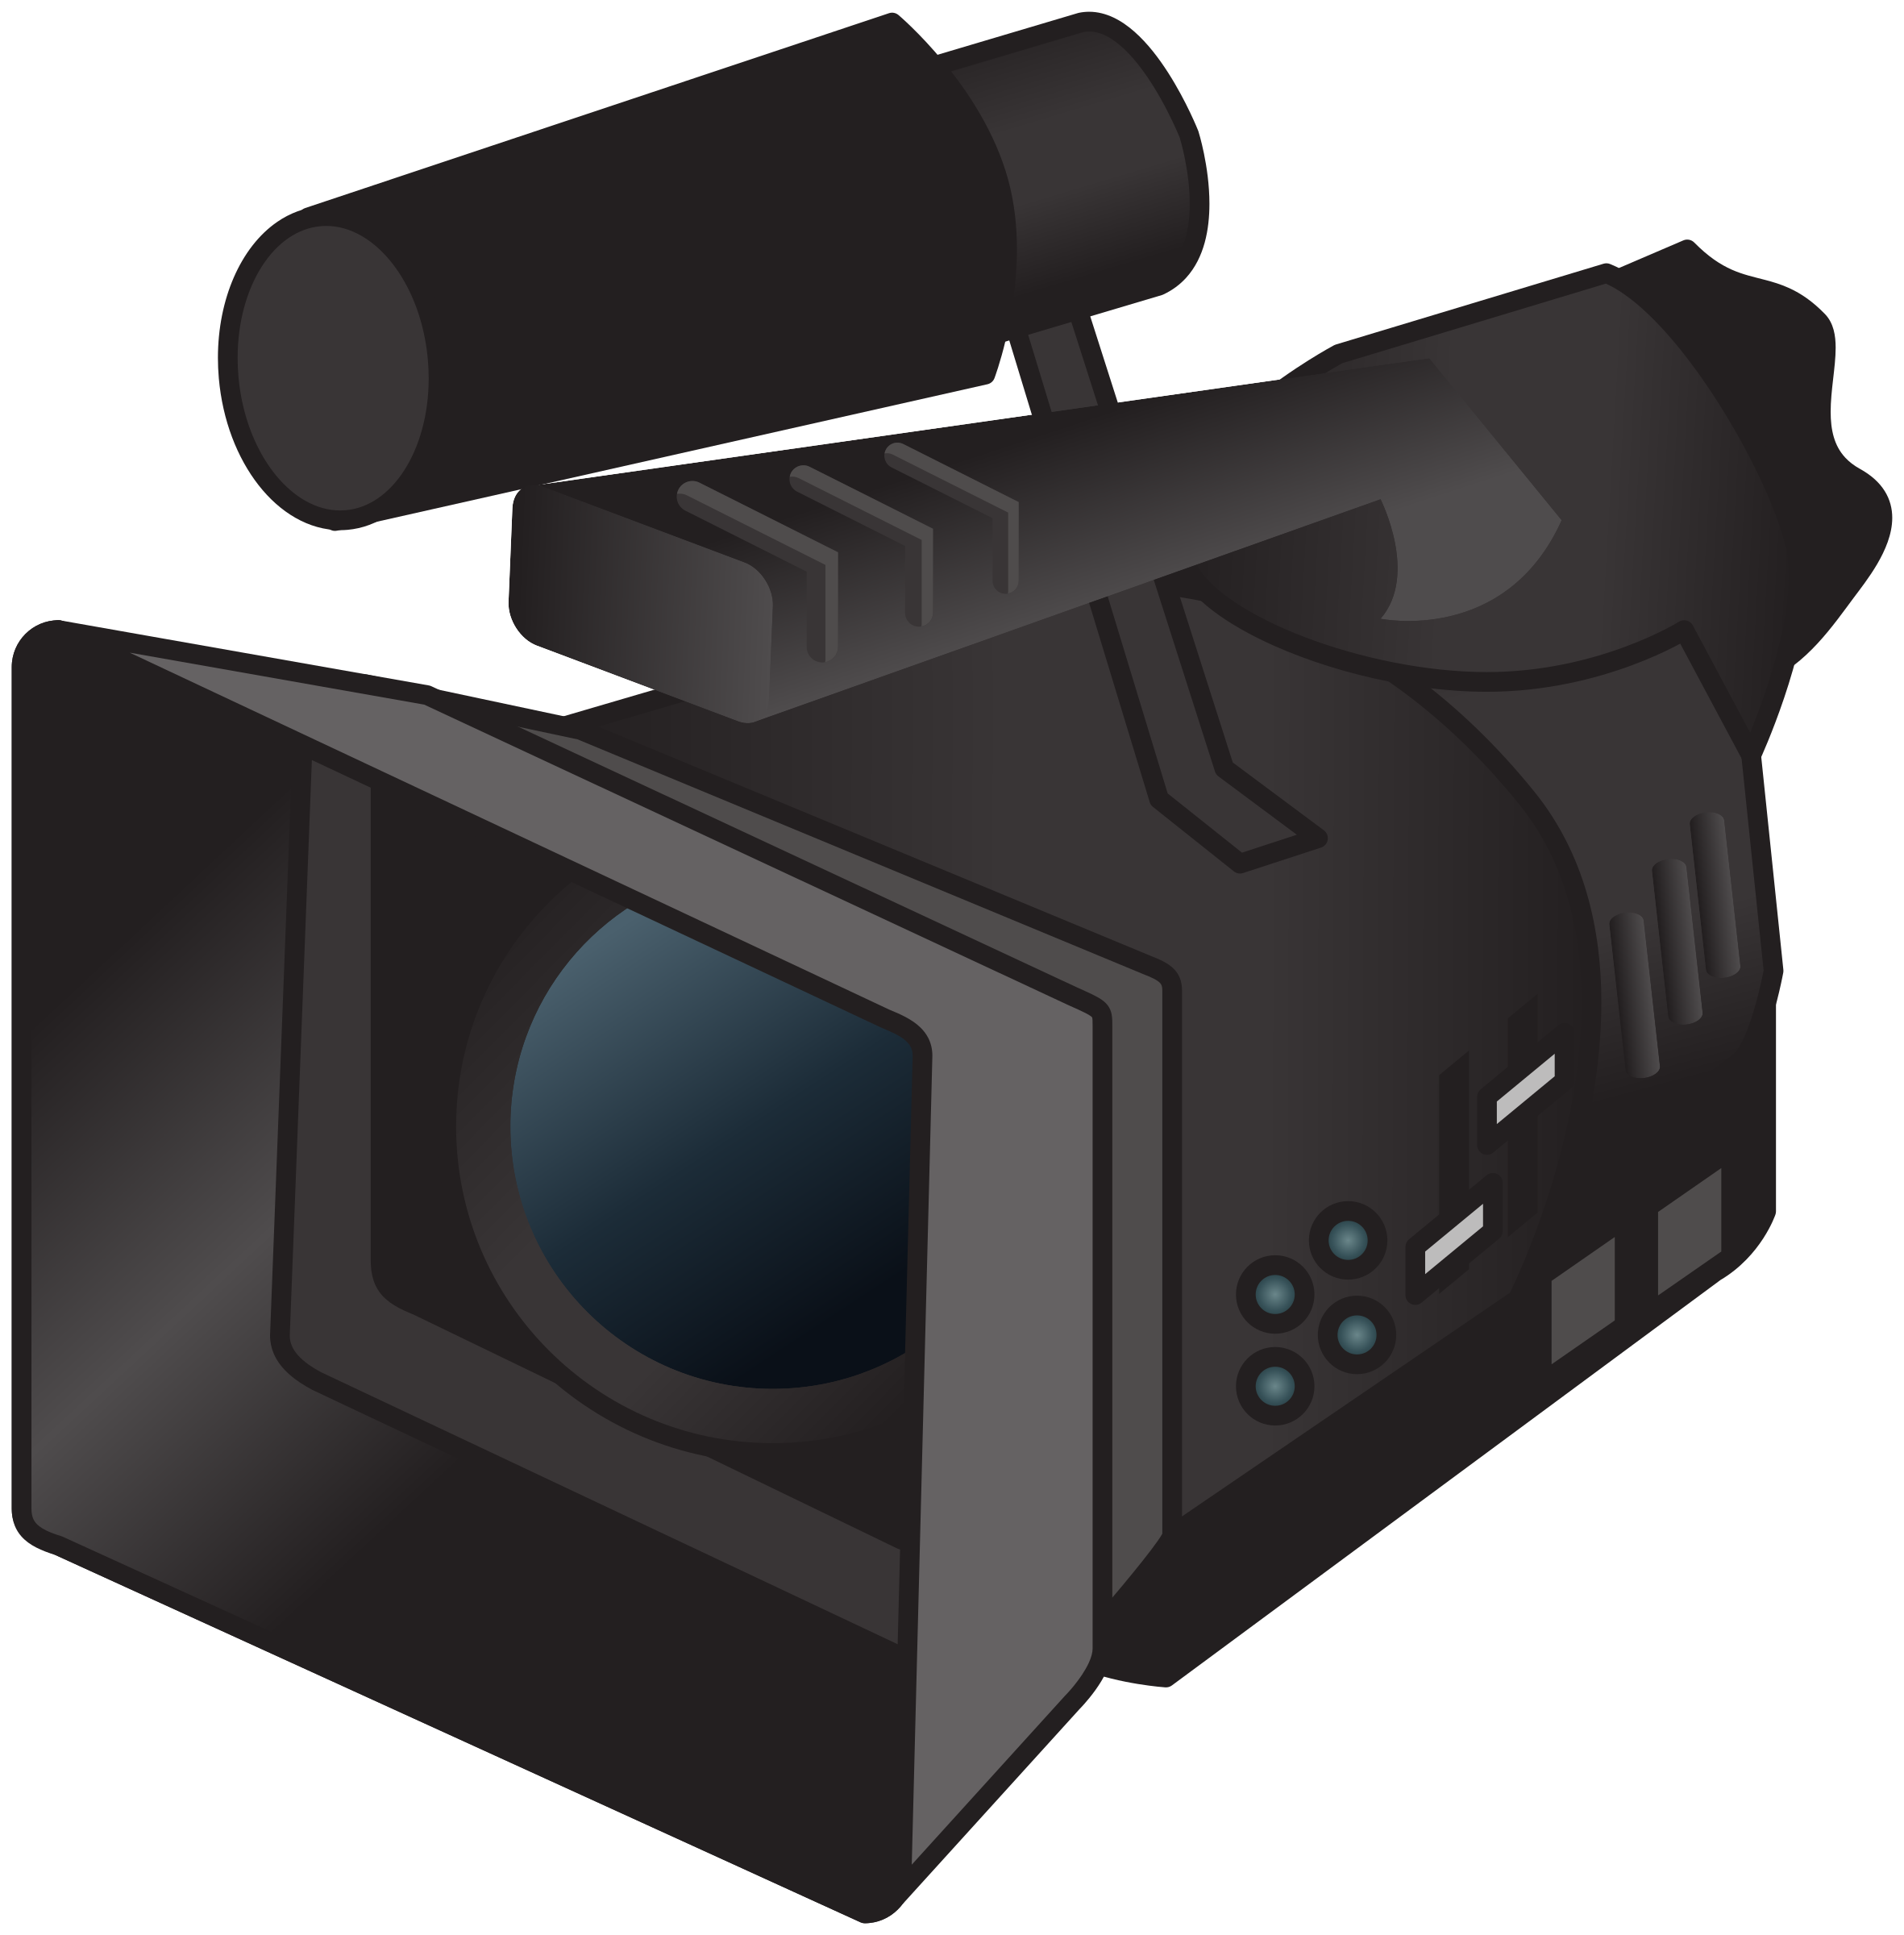 Professional big image png. Television clipart television camera